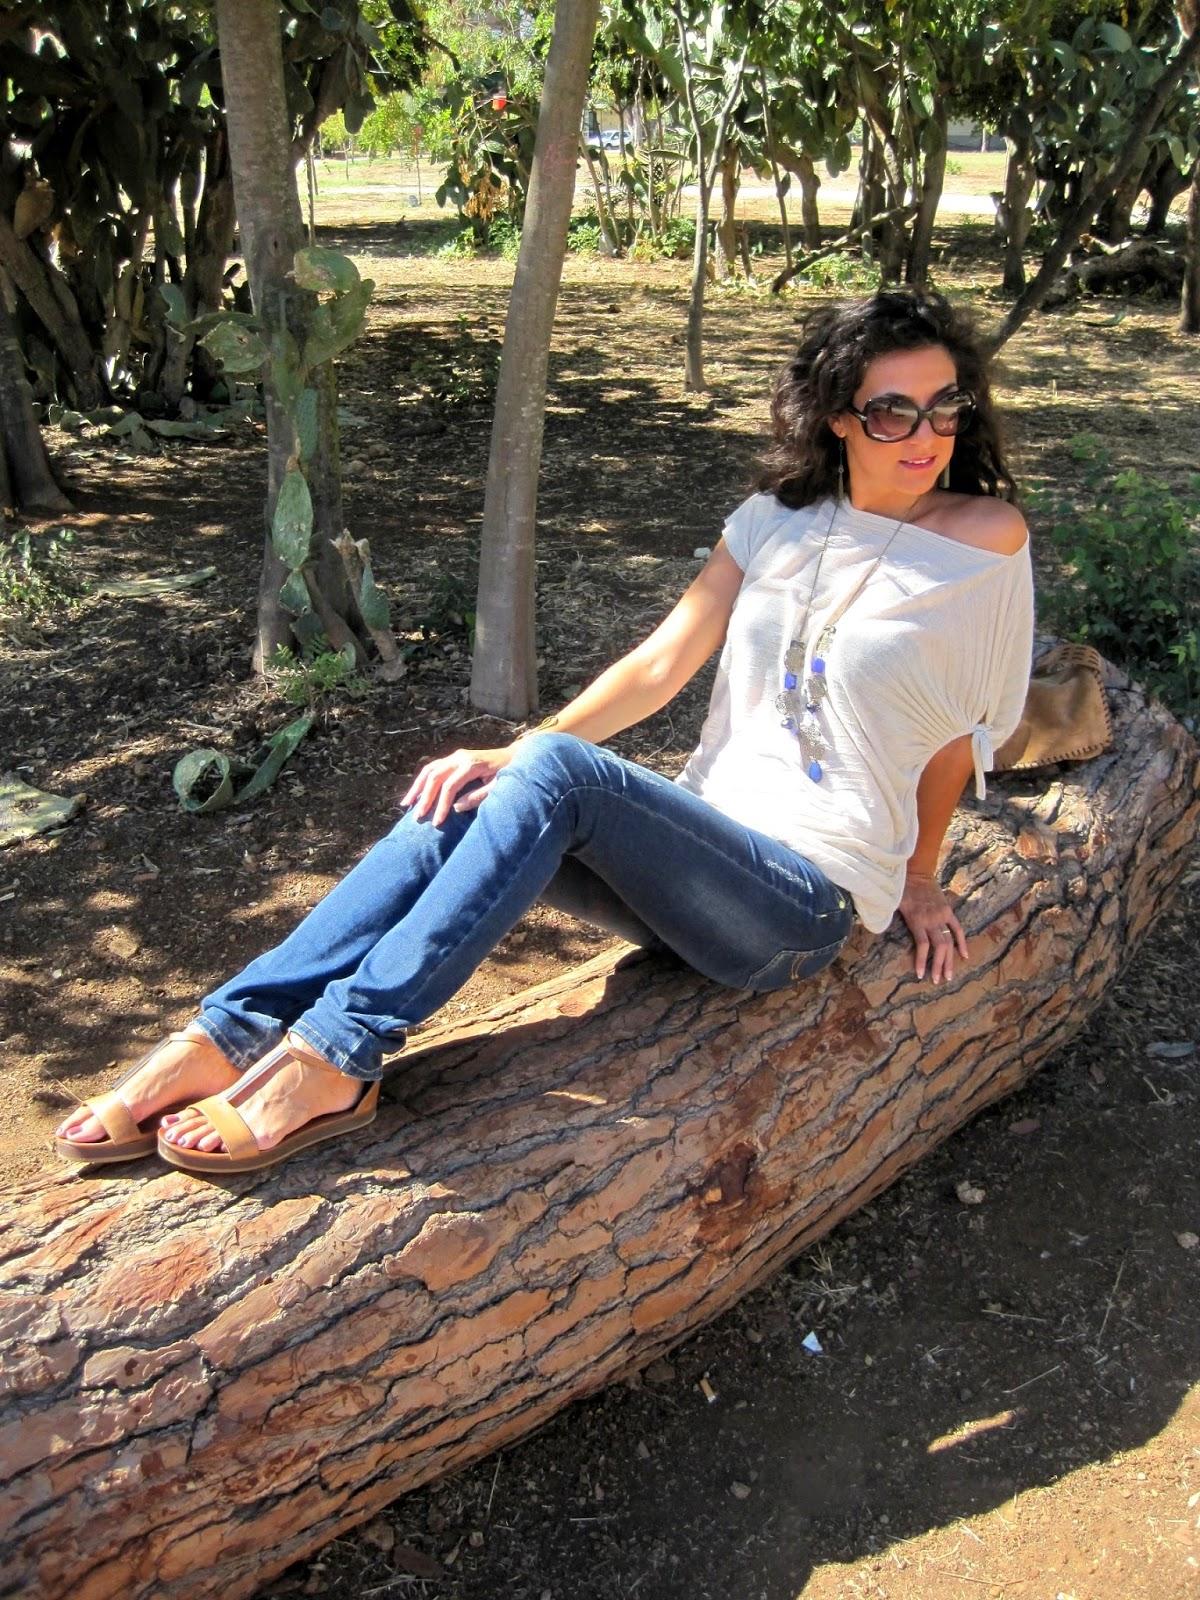 la-sciarpa-viola-beige-sicily-parco